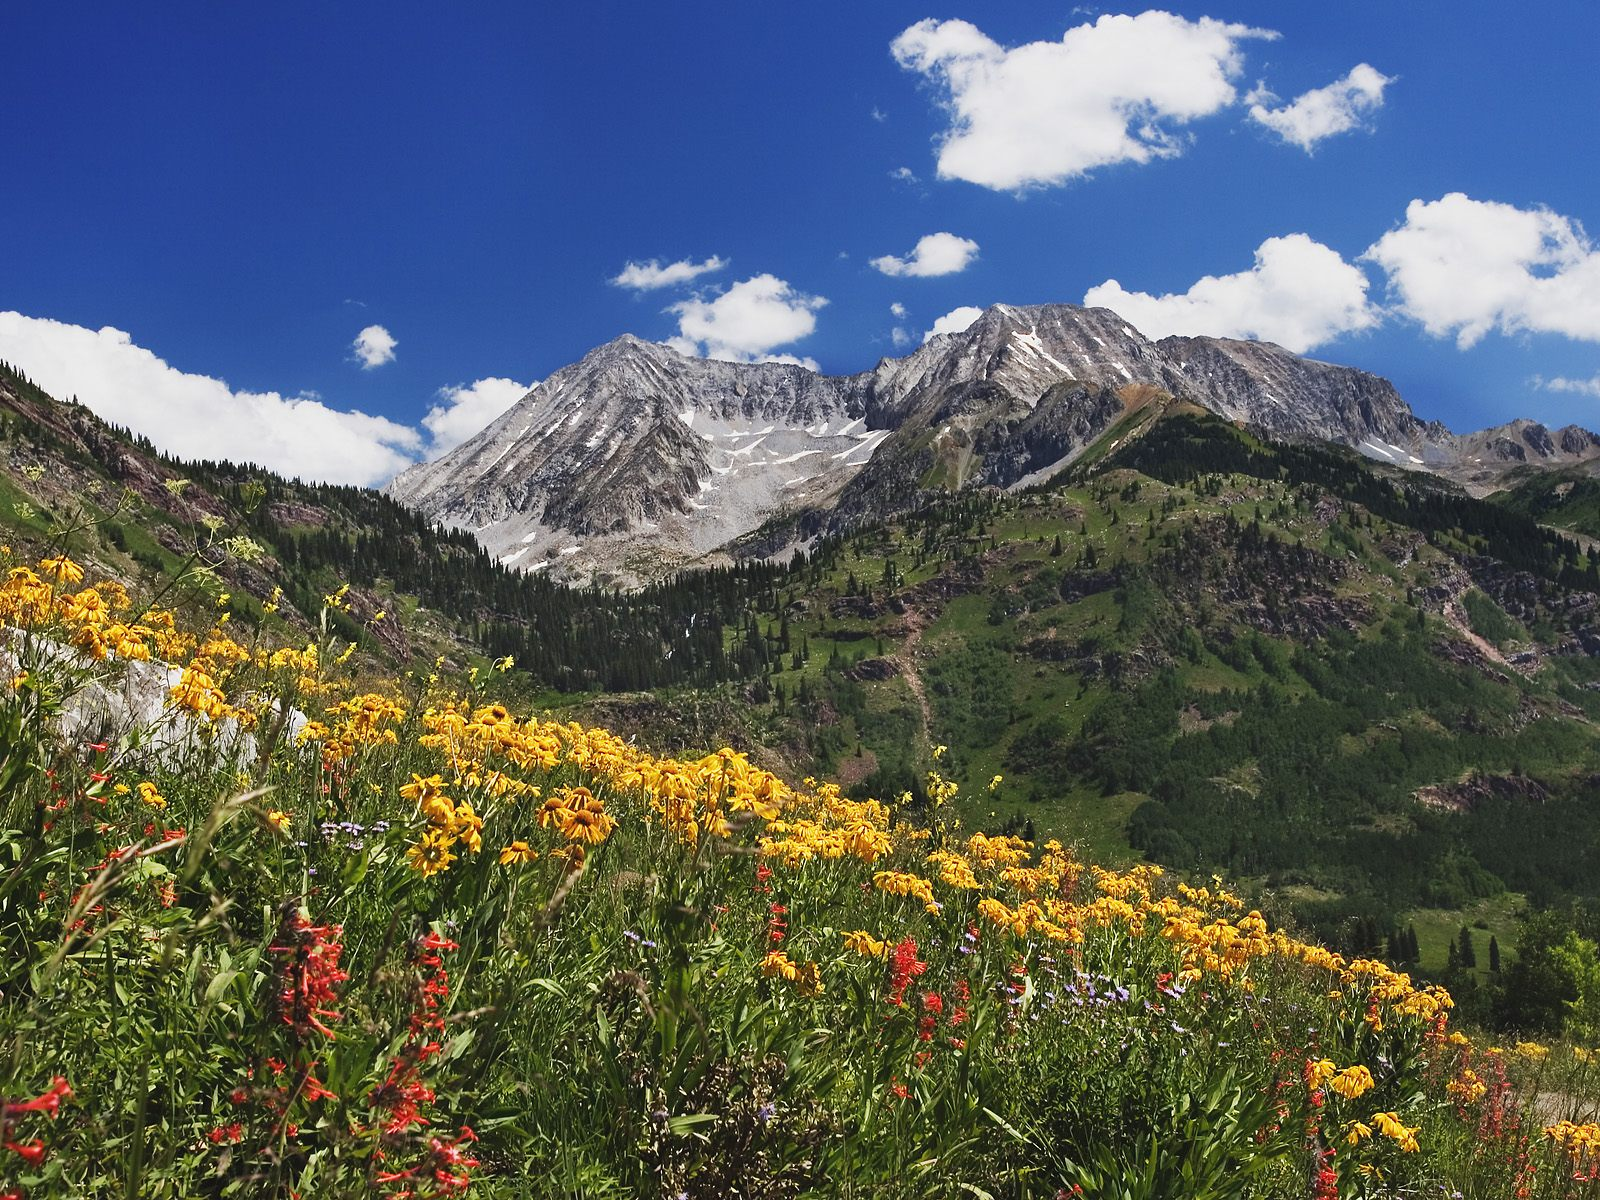 2 Spring Wildflowers in Alpine Meadow at Lead King Basin in Marble Colorado Miranda Cosgrove Fakes Pics. Jun25. Miranda Cosgrove Fakes Pics